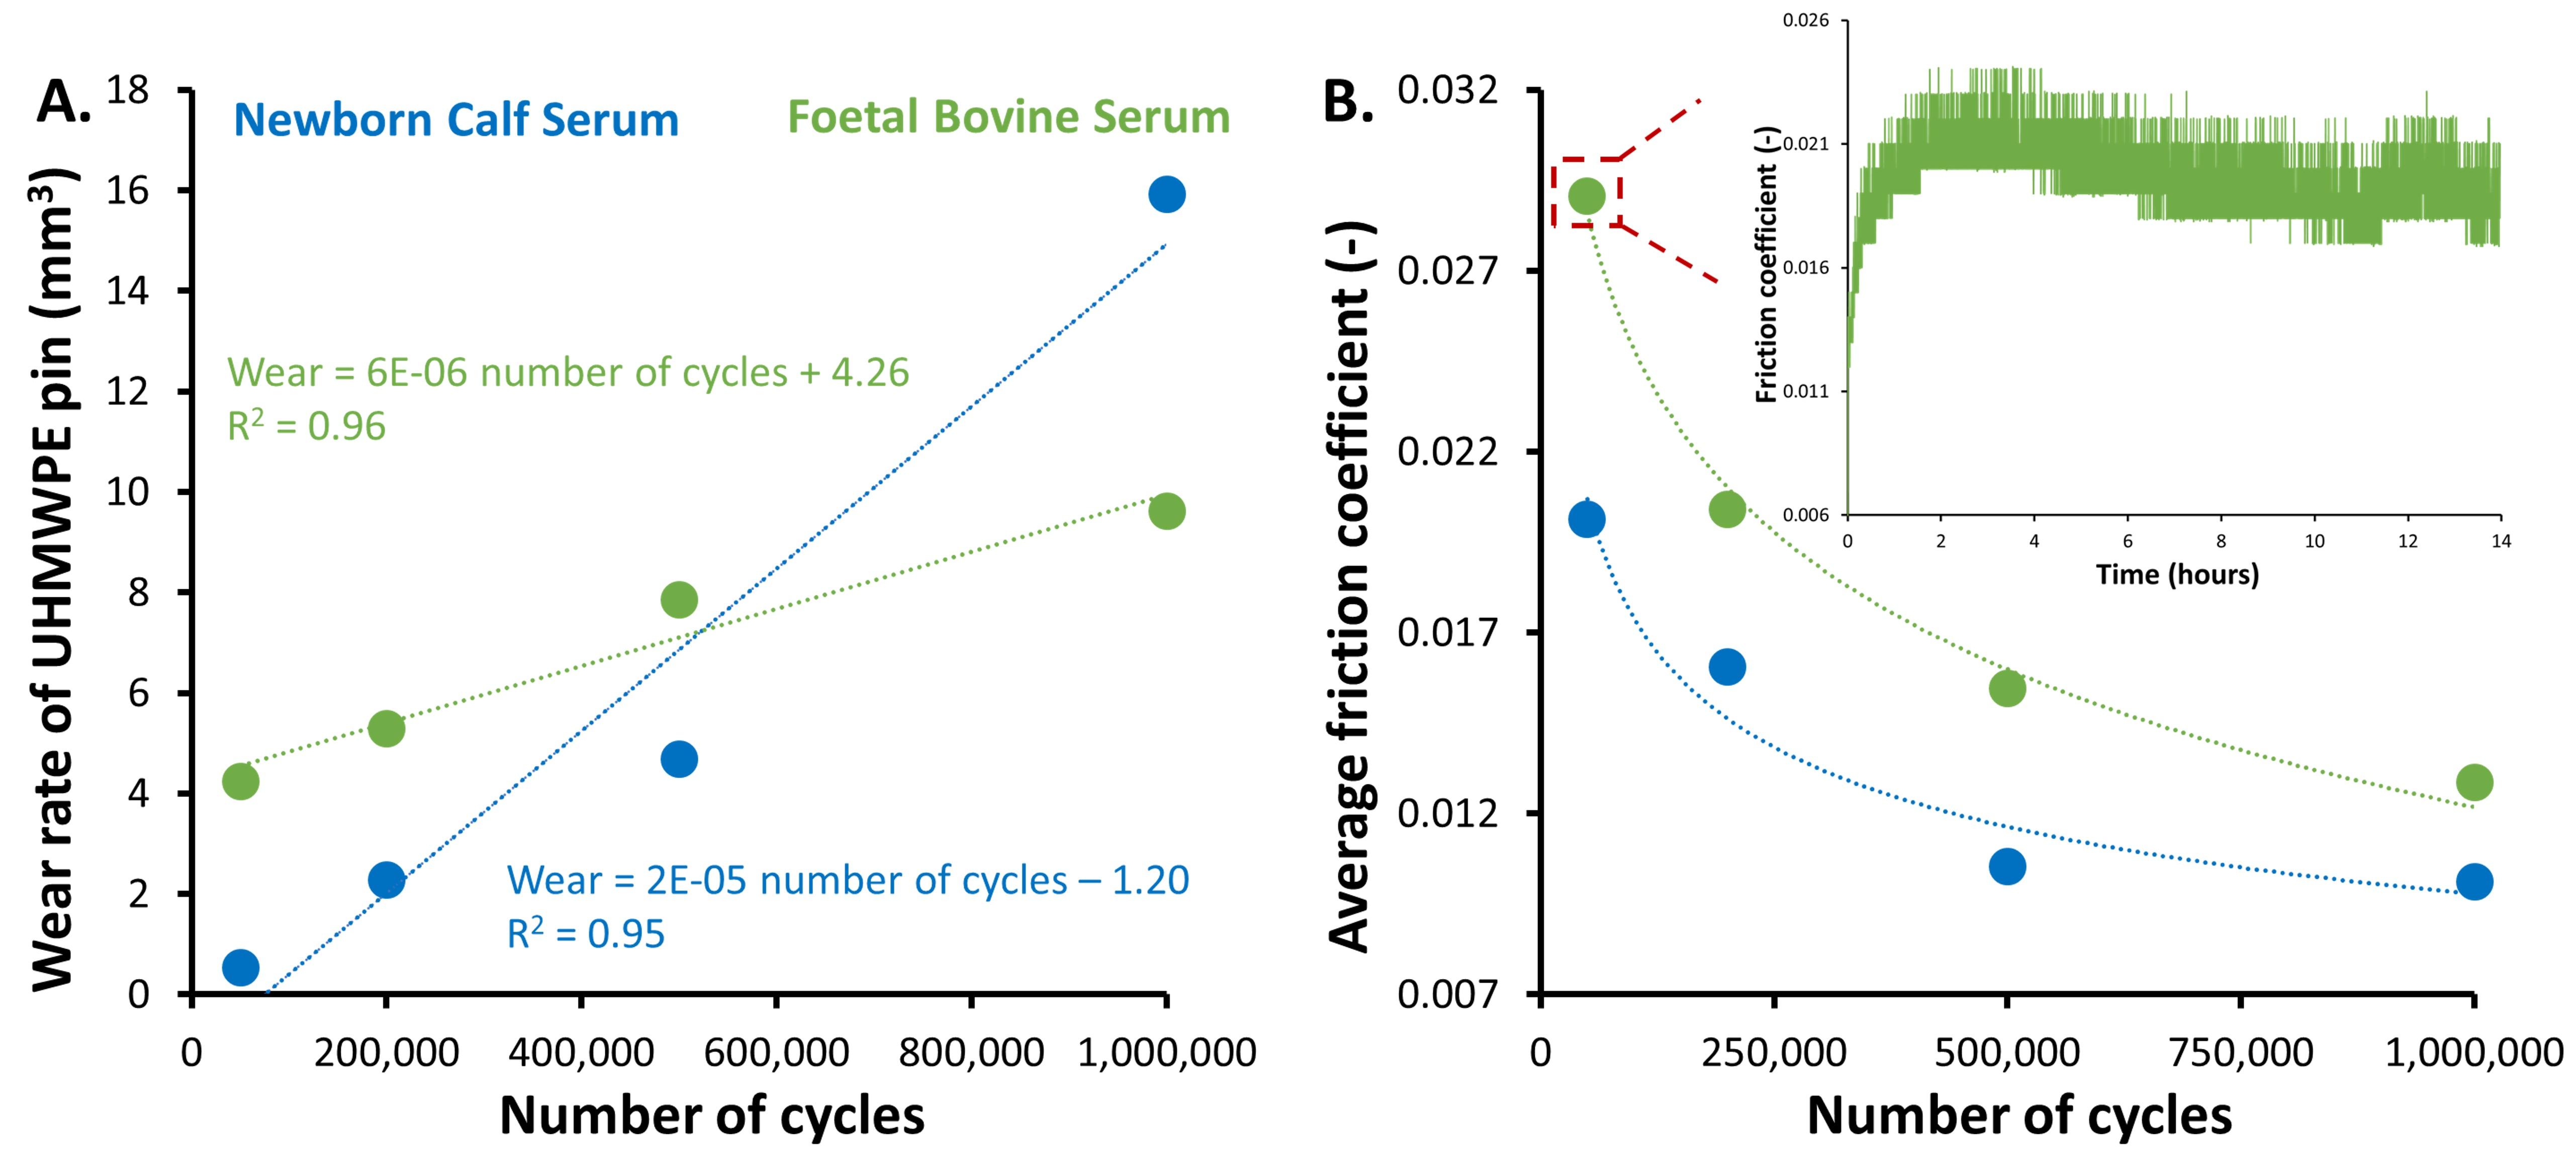 BT_Foetal vs Calf serum